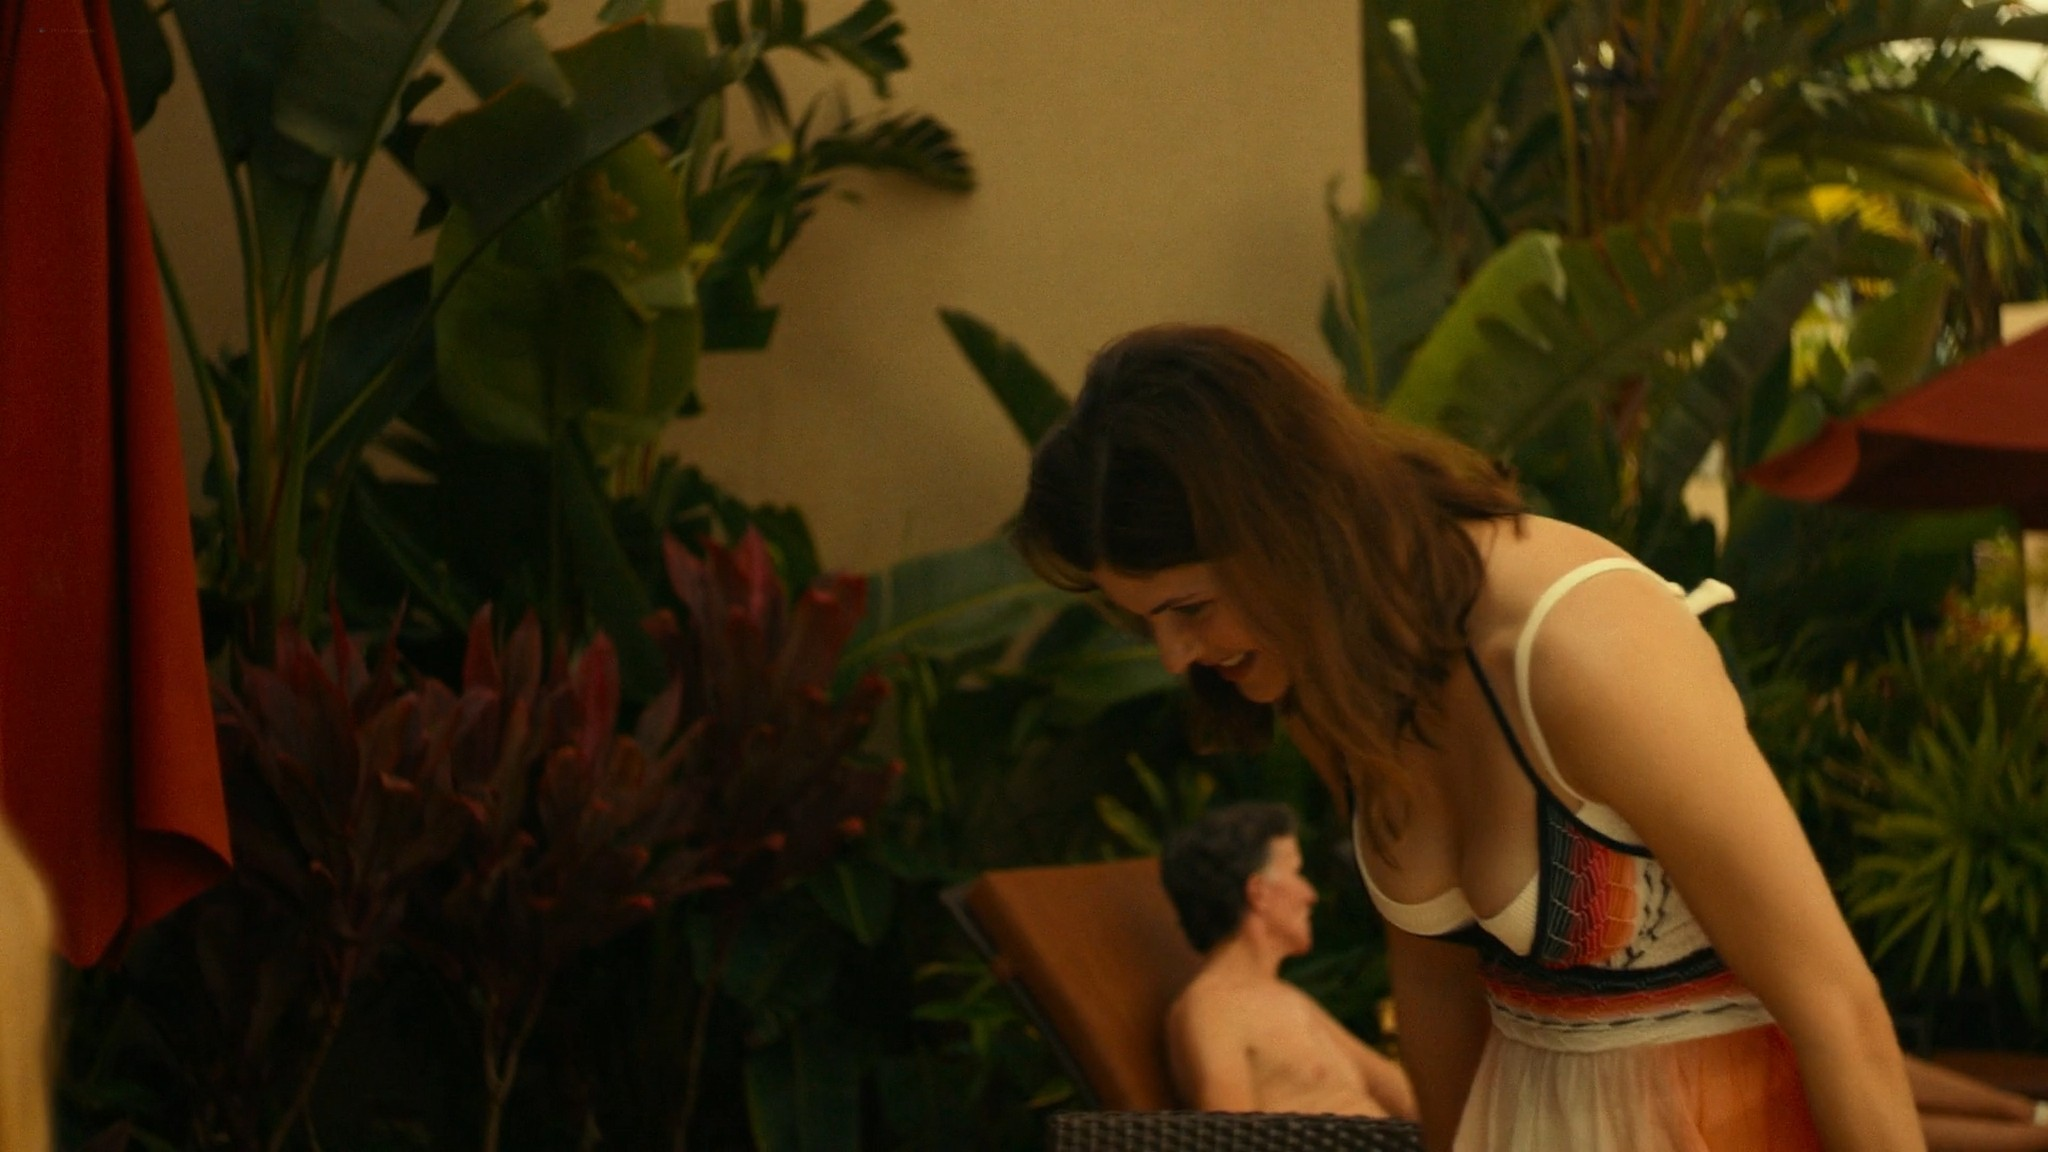 Alexandra Daddario nude side boob Sydney Sweeney Brittany OGrady hot The White Lotus 2011 s1e2 1080p Web 16